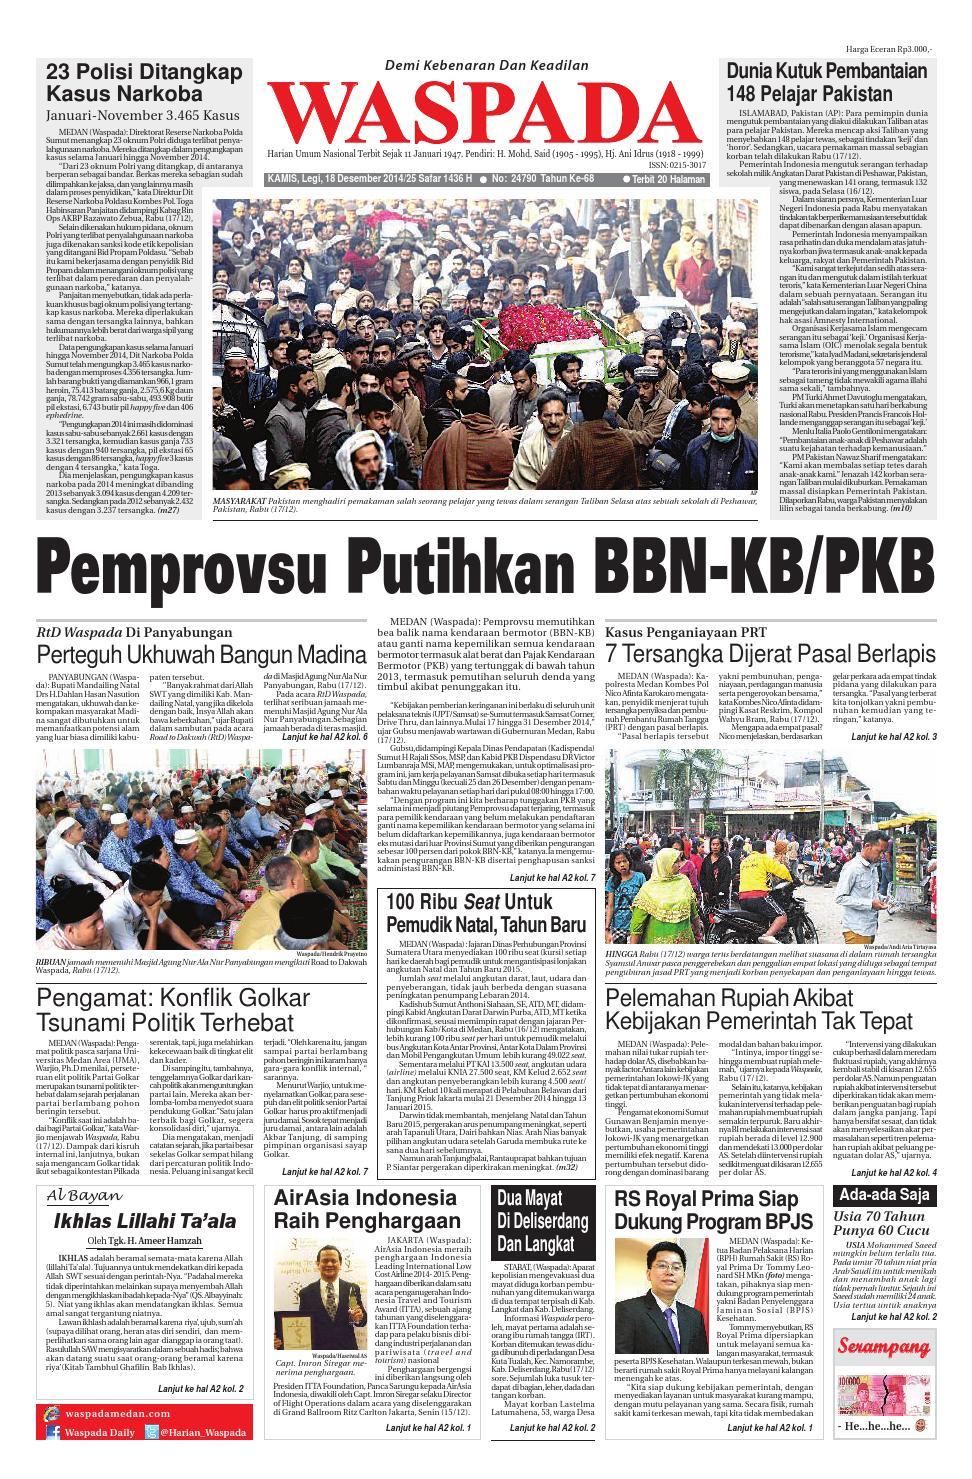 Waspada Kamis 18 Desember 2014 By Harian Issuu Produk Ukm Bumn Tas Ransel Threepoint